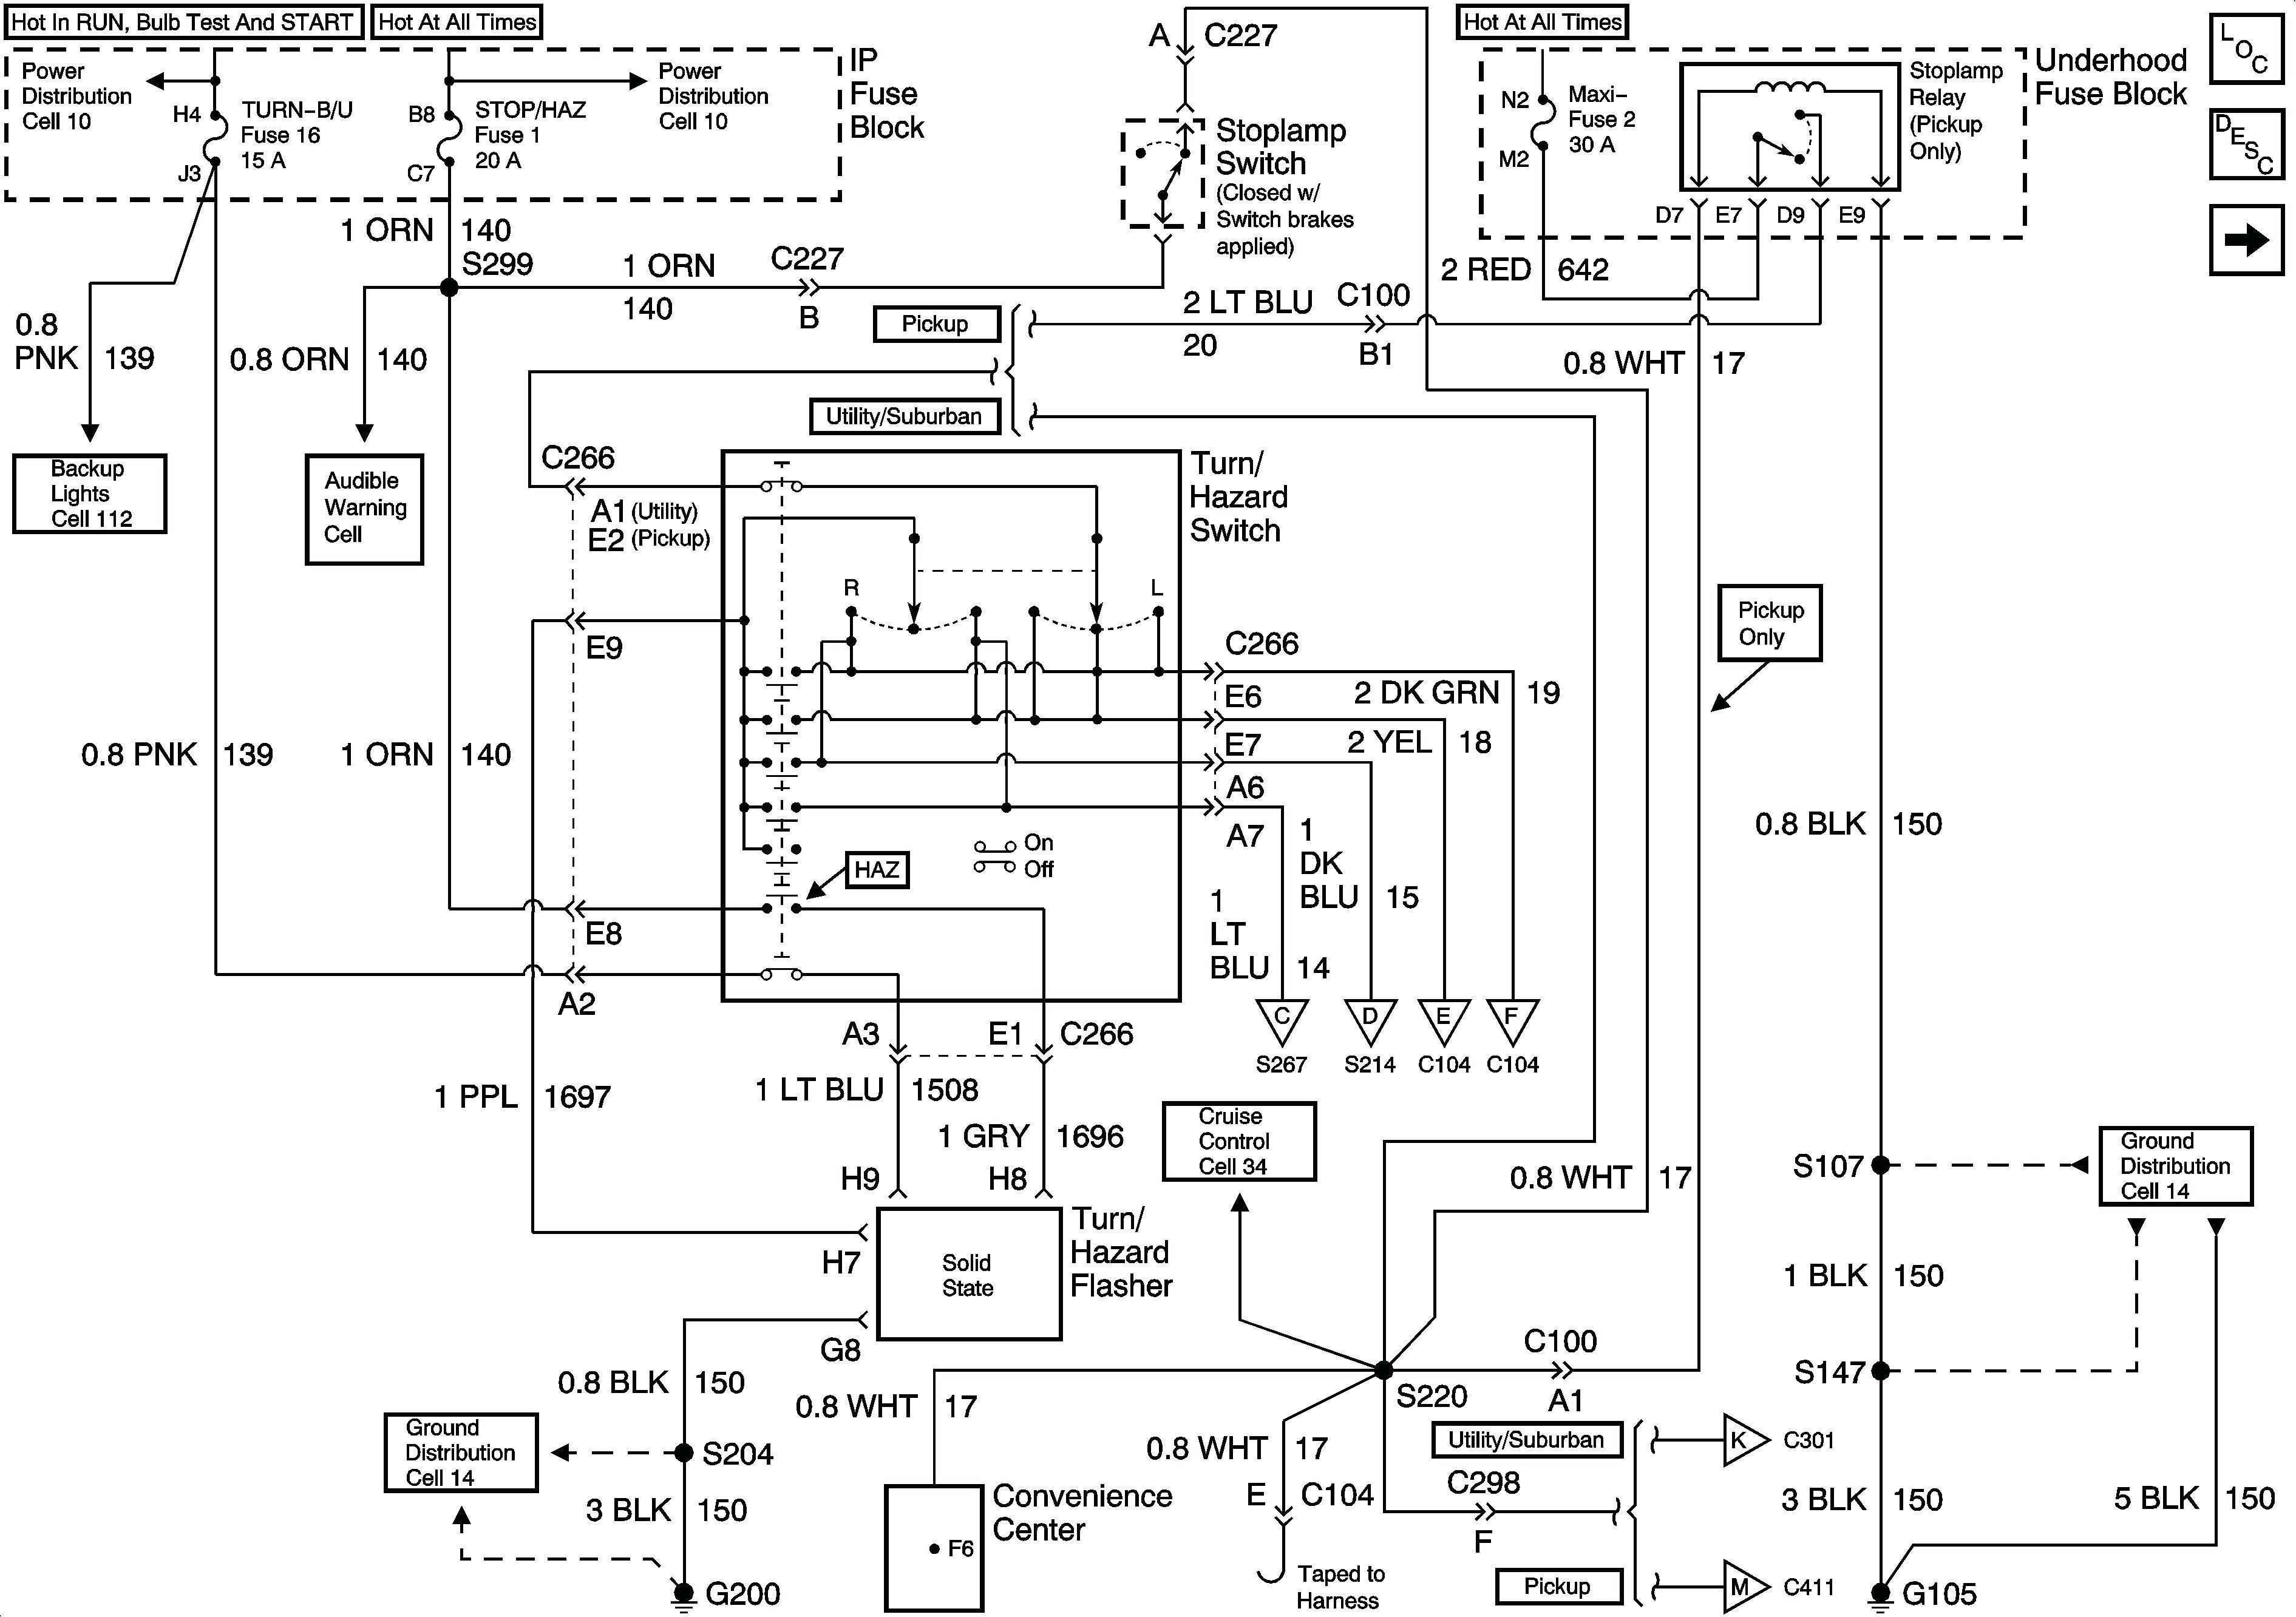 2007 Saturn Aura Engine Diagram 2007 Buick Lucerne Radio Wiring Diagram Shahsramblings Of 2007 Saturn Aura Engine Diagram